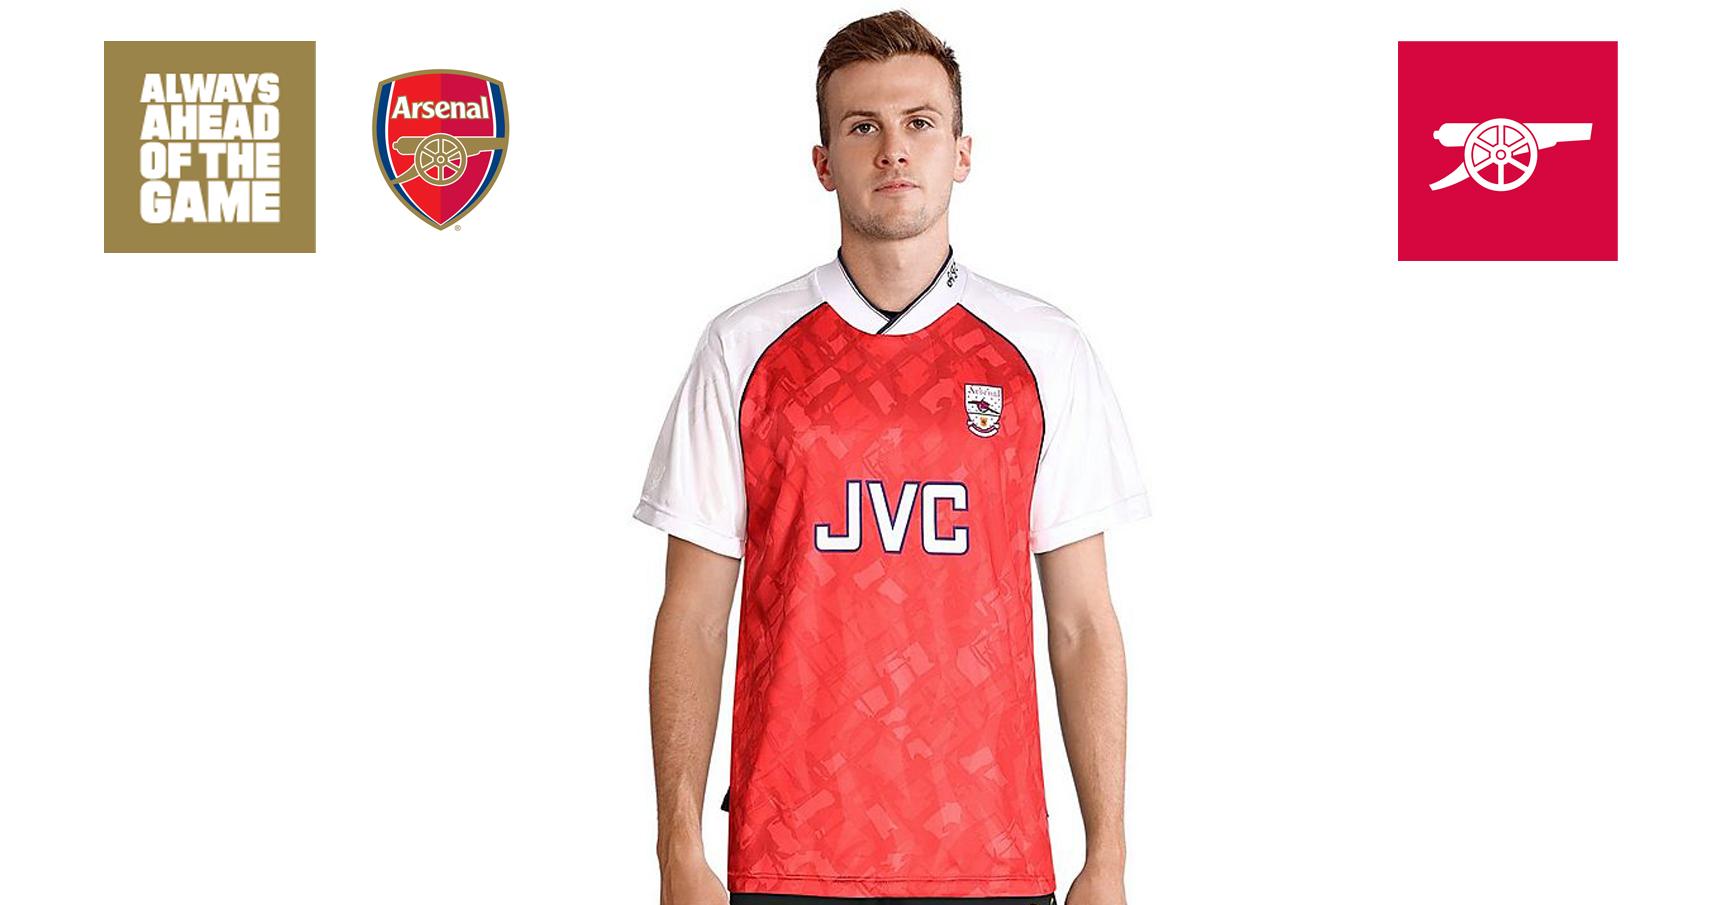 newest 812fa 80a0b Cannon - Win a retro Arsenal shirt | News | Arsenal.com